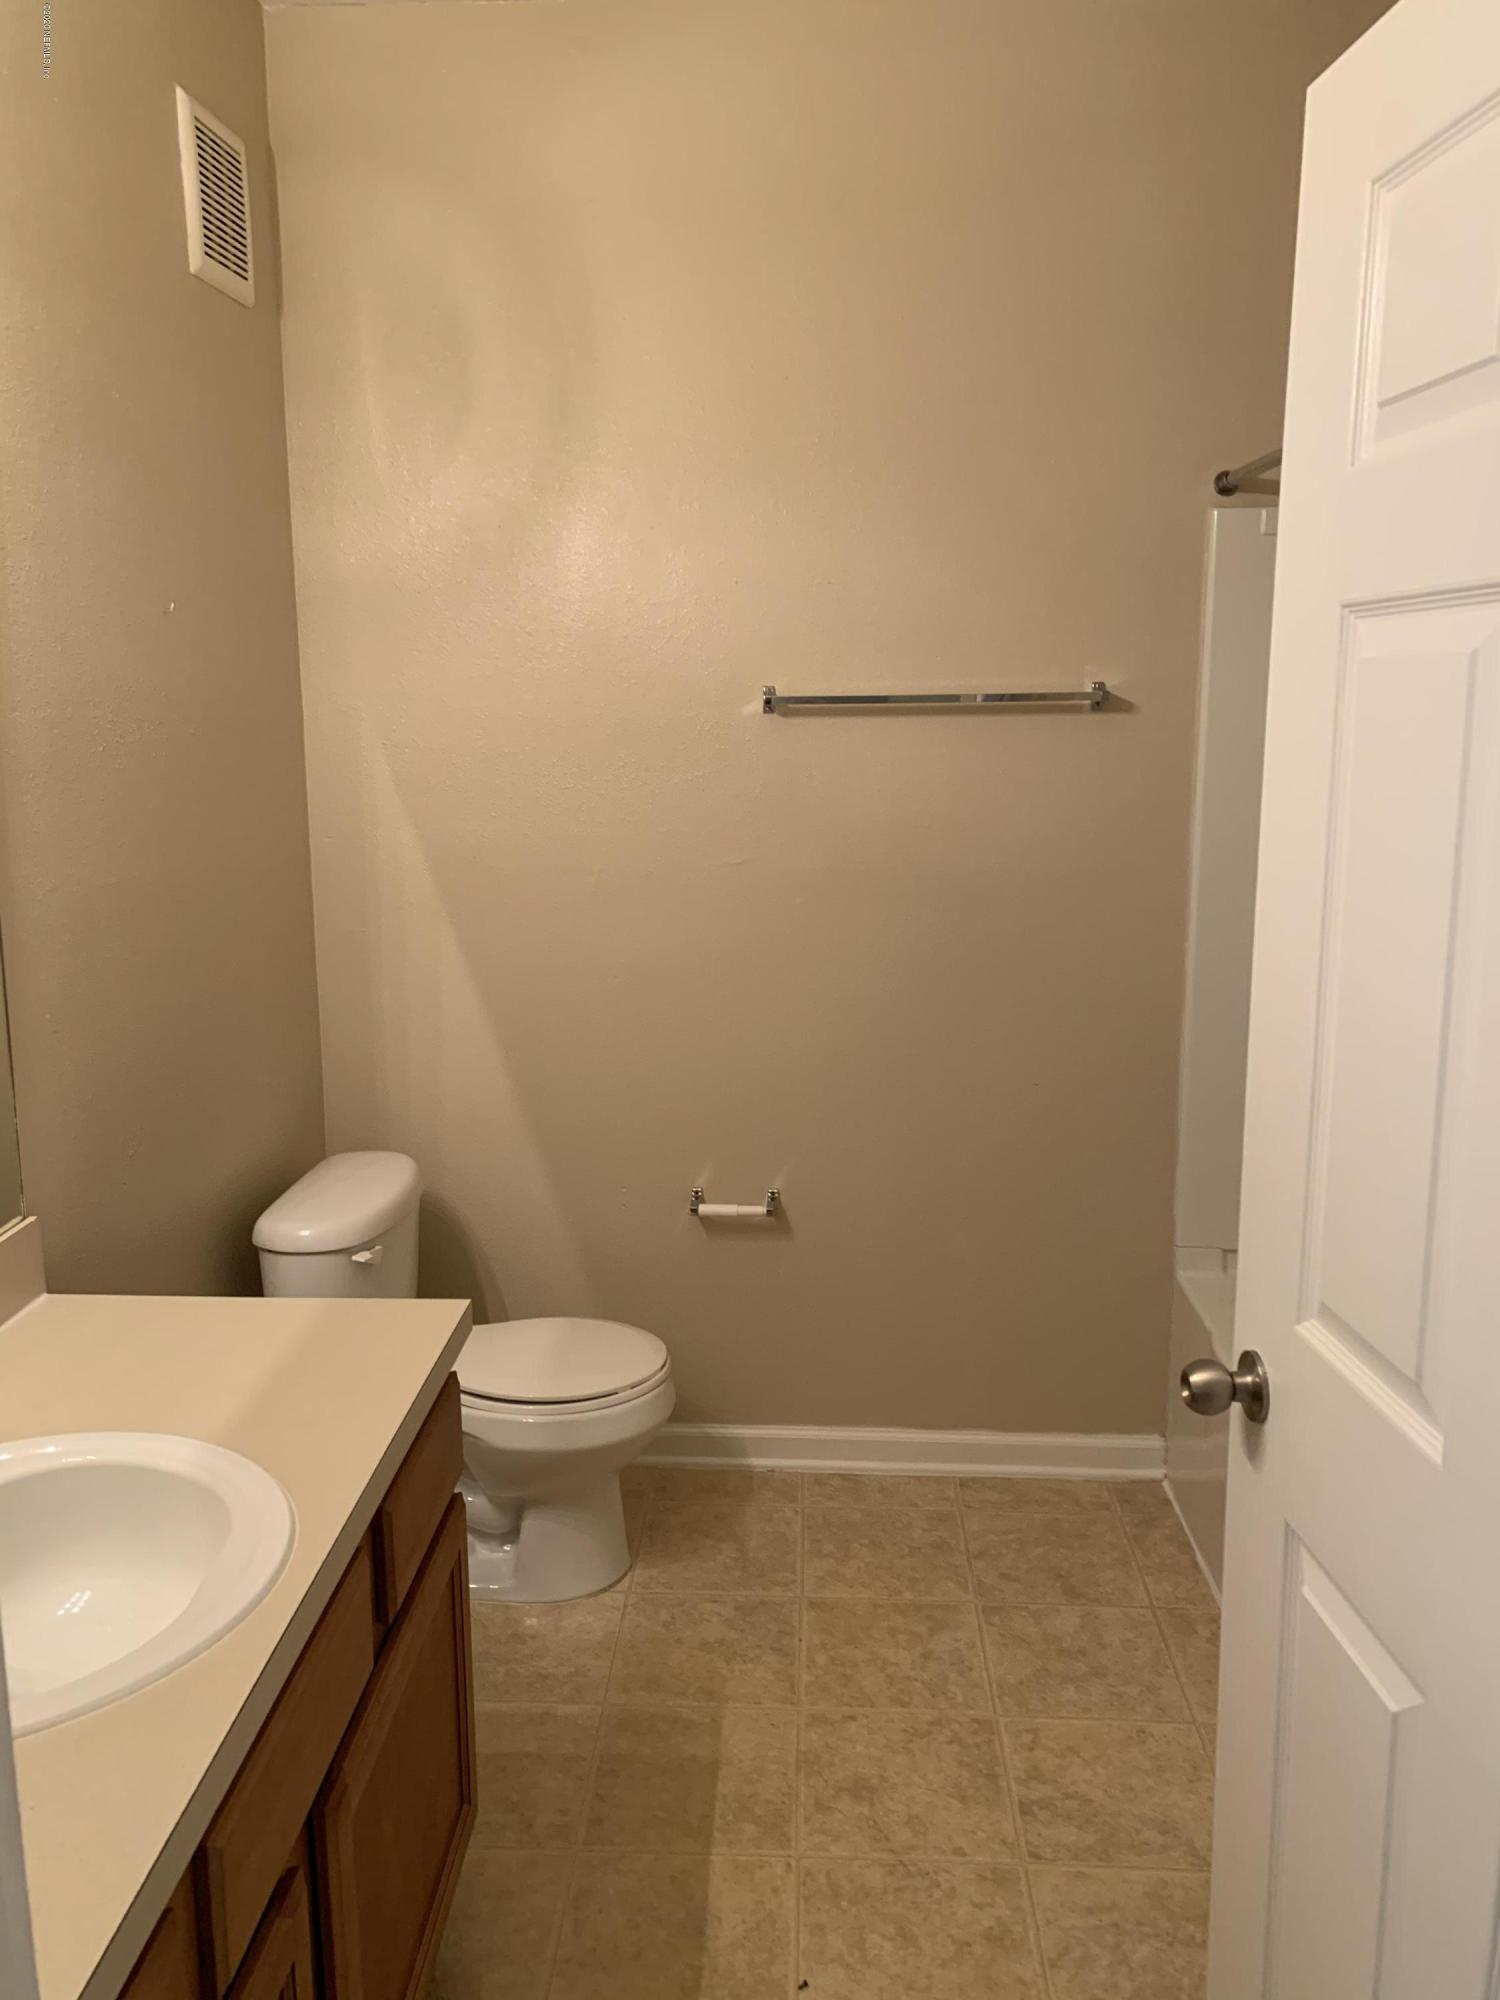 6915 ORTEGA WOODS, JACKSONVILLE, FLORIDA 32244, 2 Bedrooms Bedrooms, ,2 BathroomsBathrooms,Residential,For sale,ORTEGA WOODS,1057540